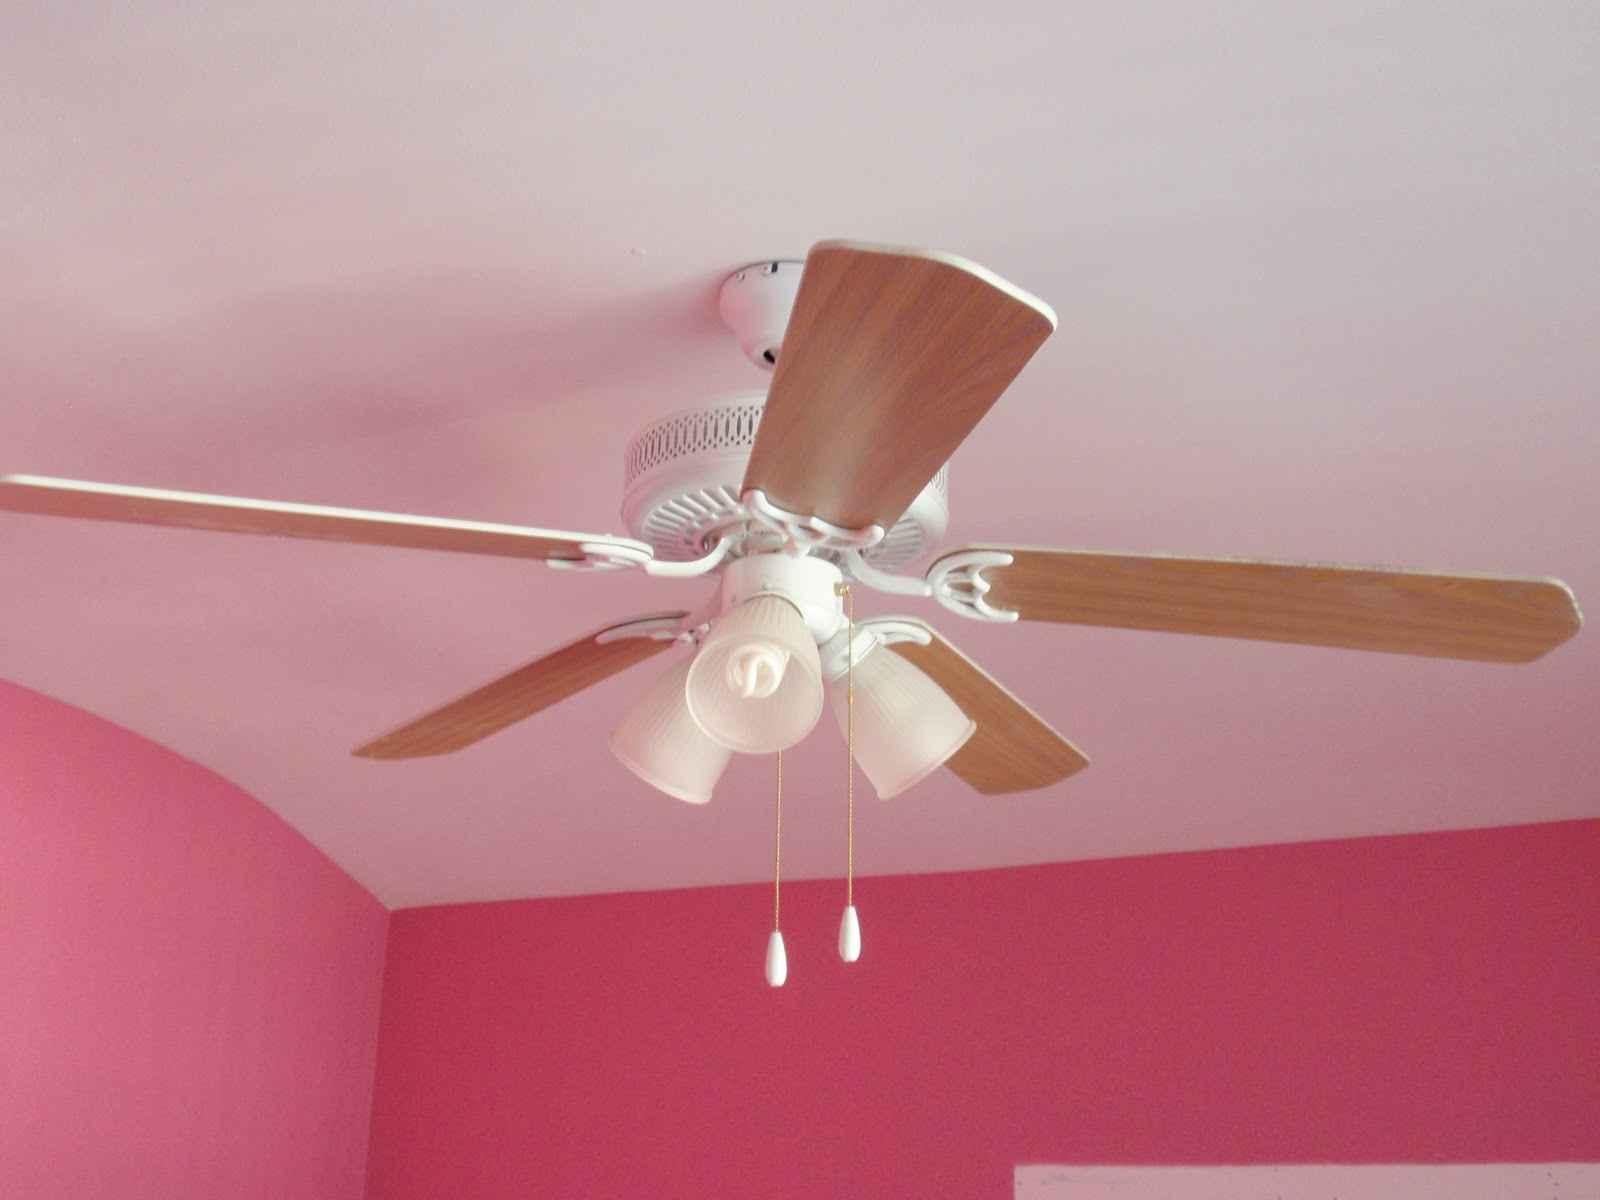 Wooden bedroom ceiling fan with light